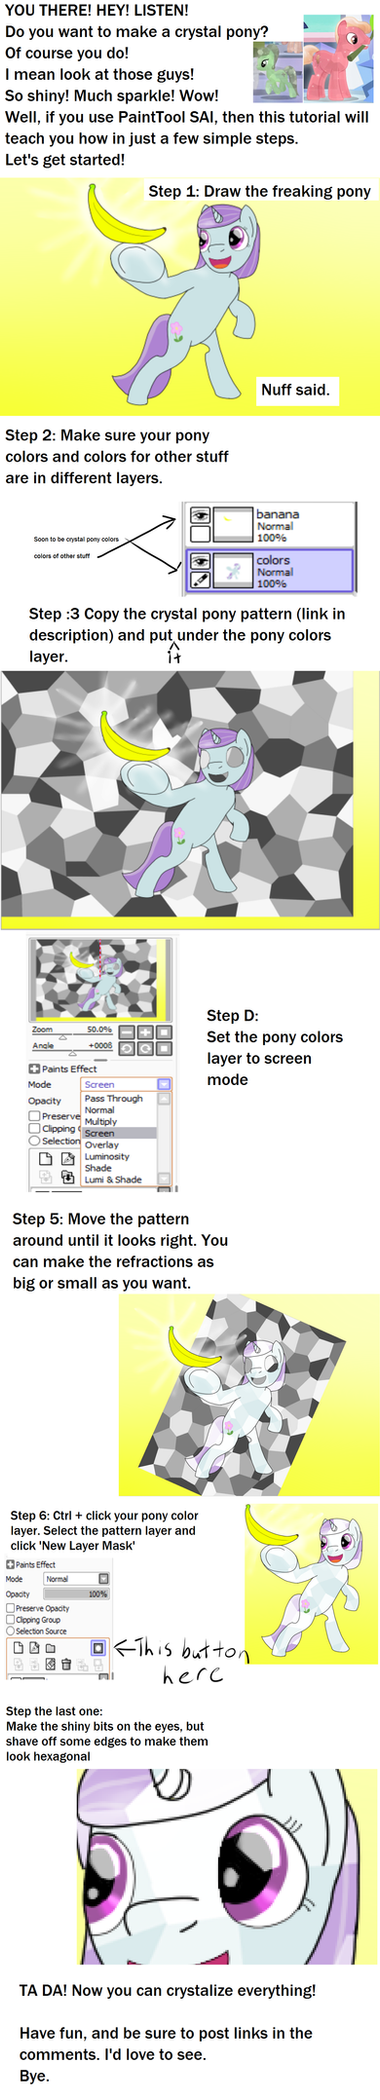 Crystal pony tutorial by Allonsbro